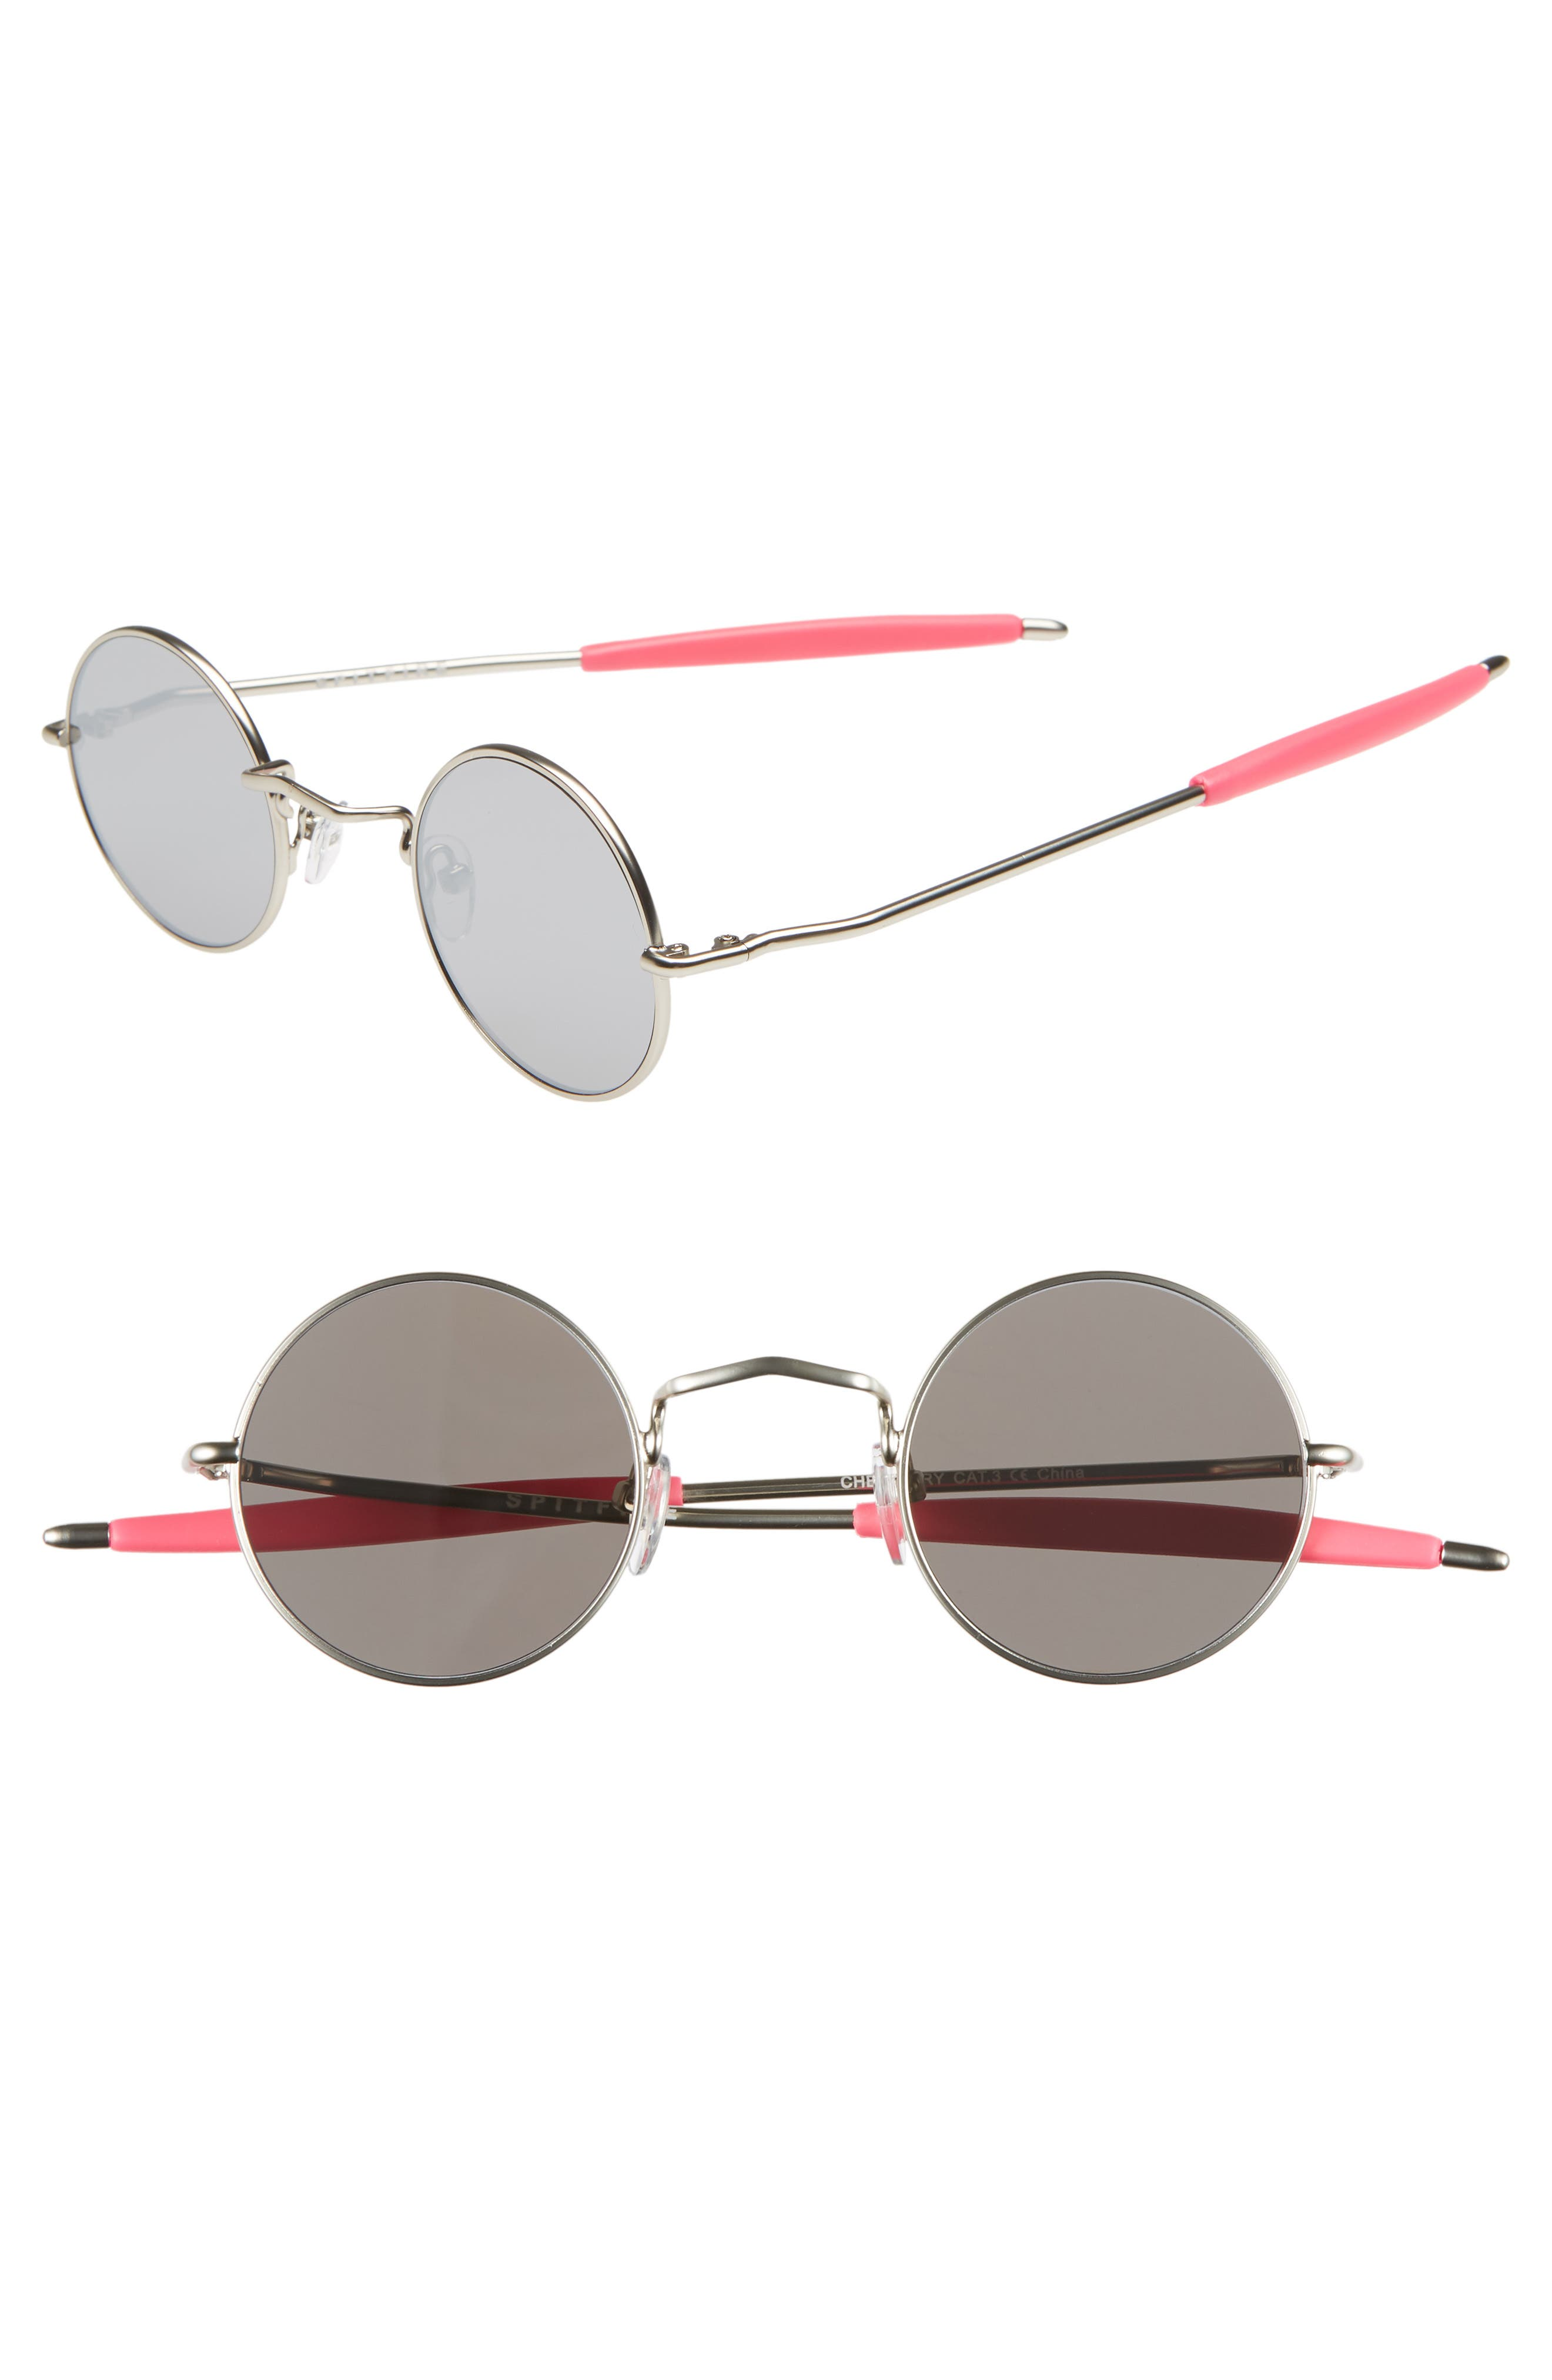 SPITFIRE Chemistry 42Mm Round Mirrored Sunglasses - Silver/ Silver Mirror